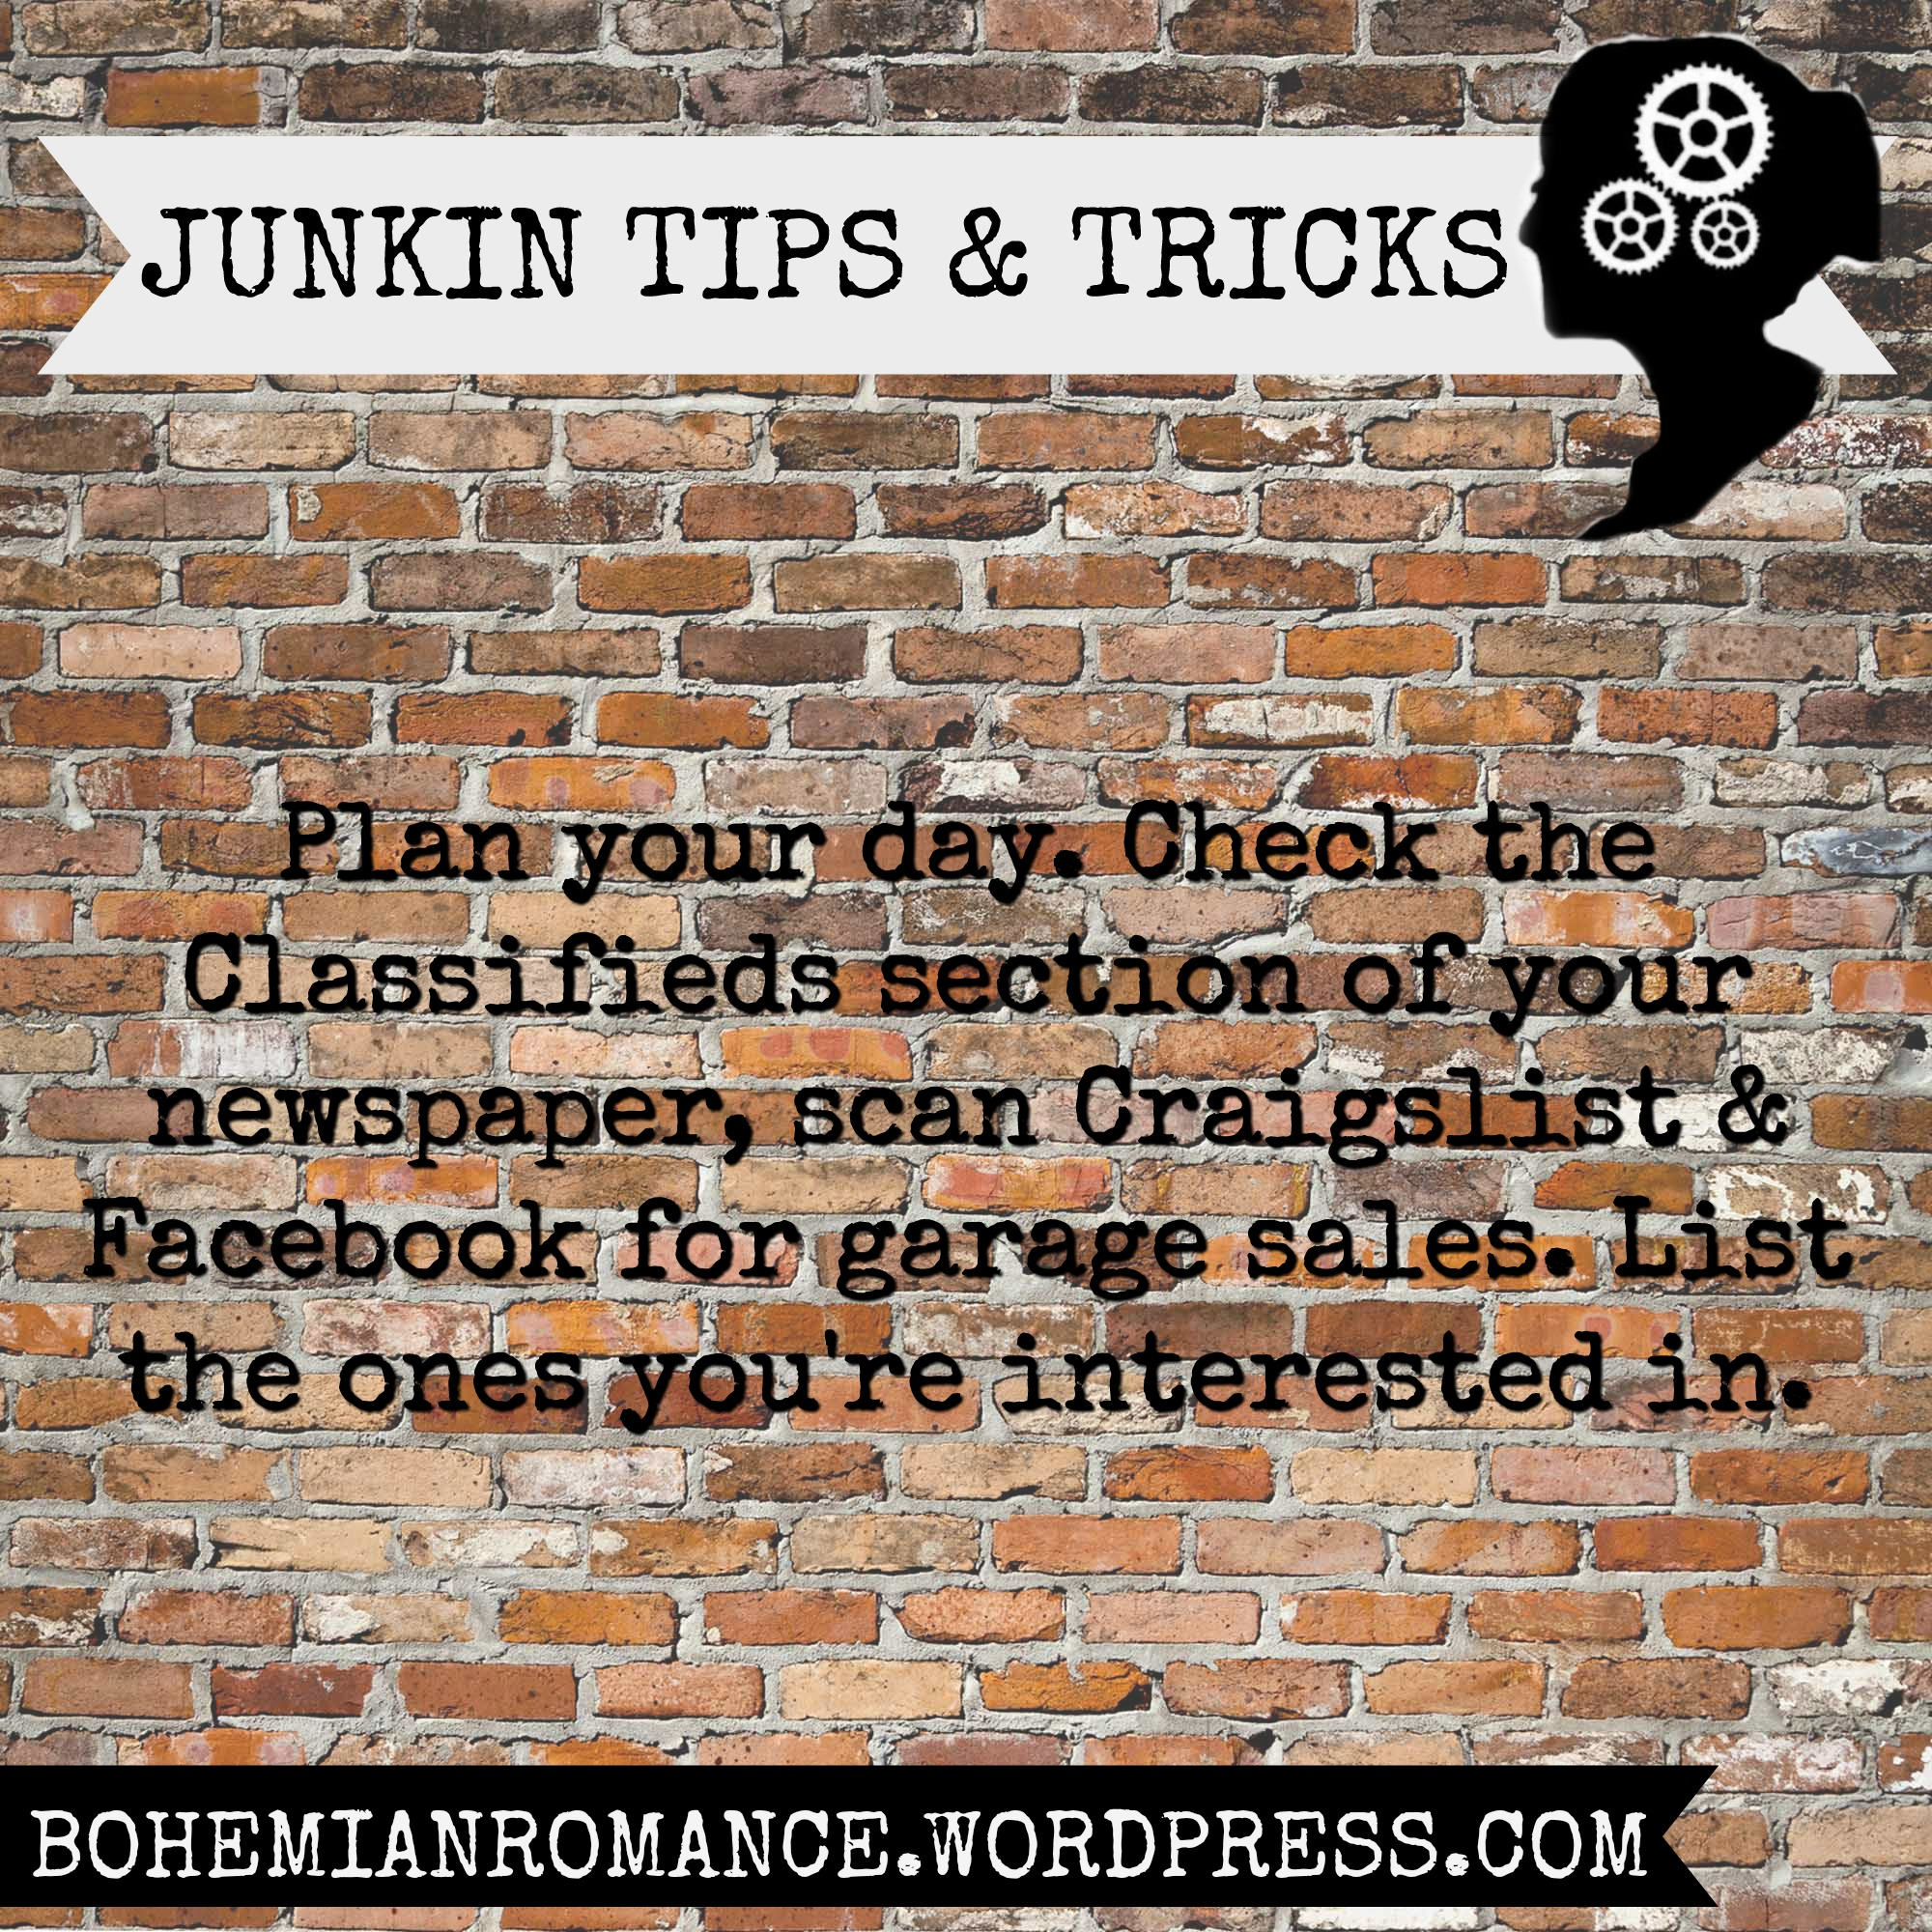 14-junkin-tips-tricks-template